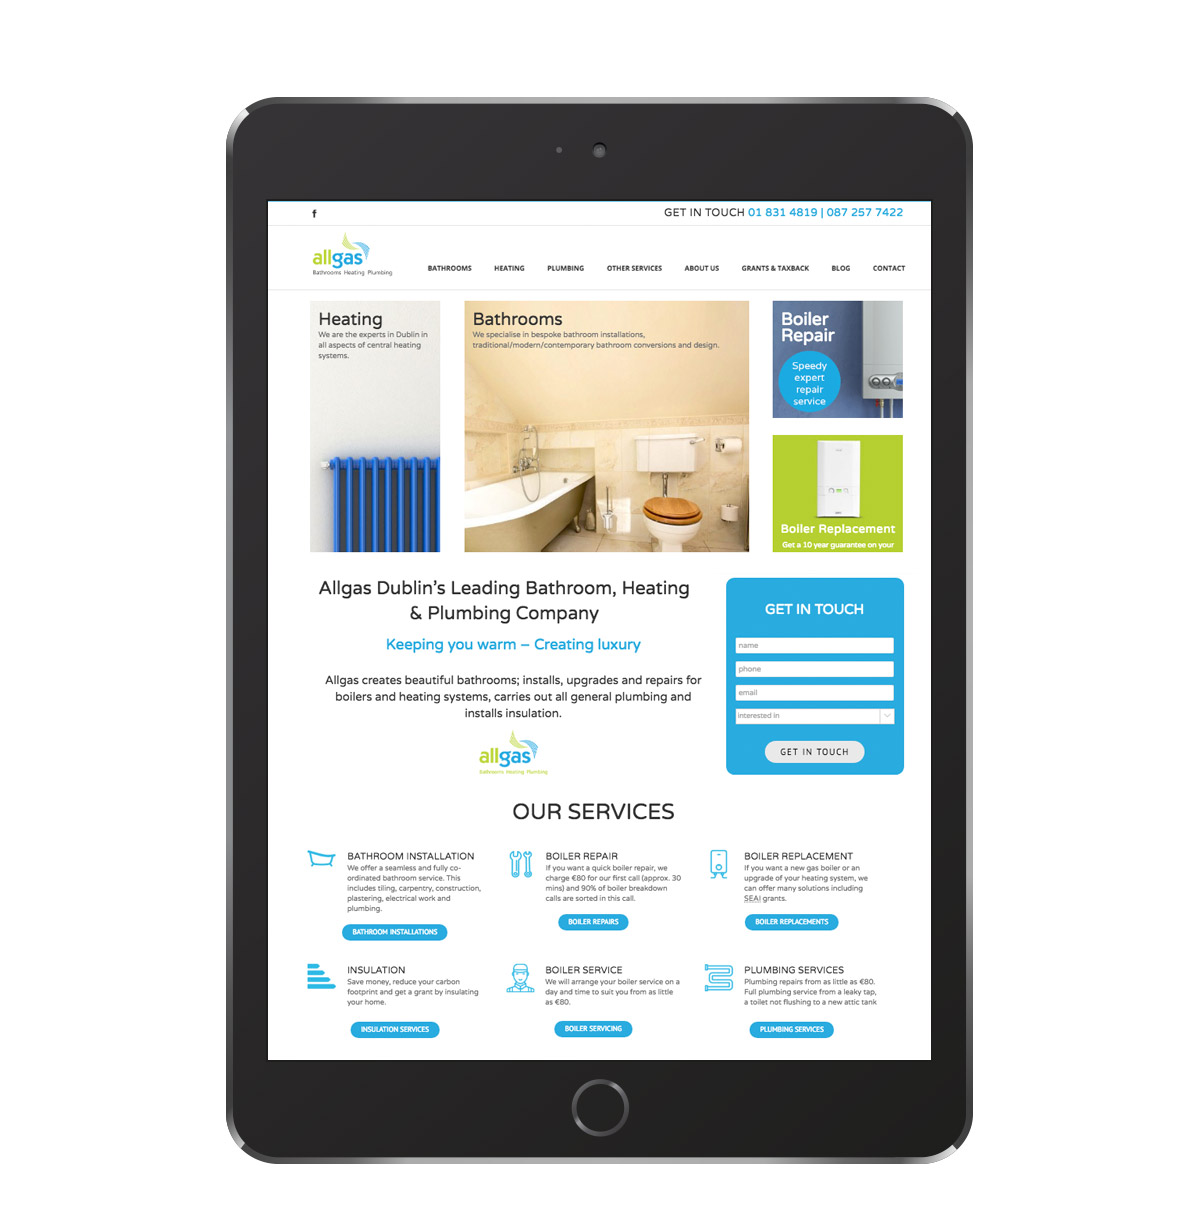 web design - all gas - dublin